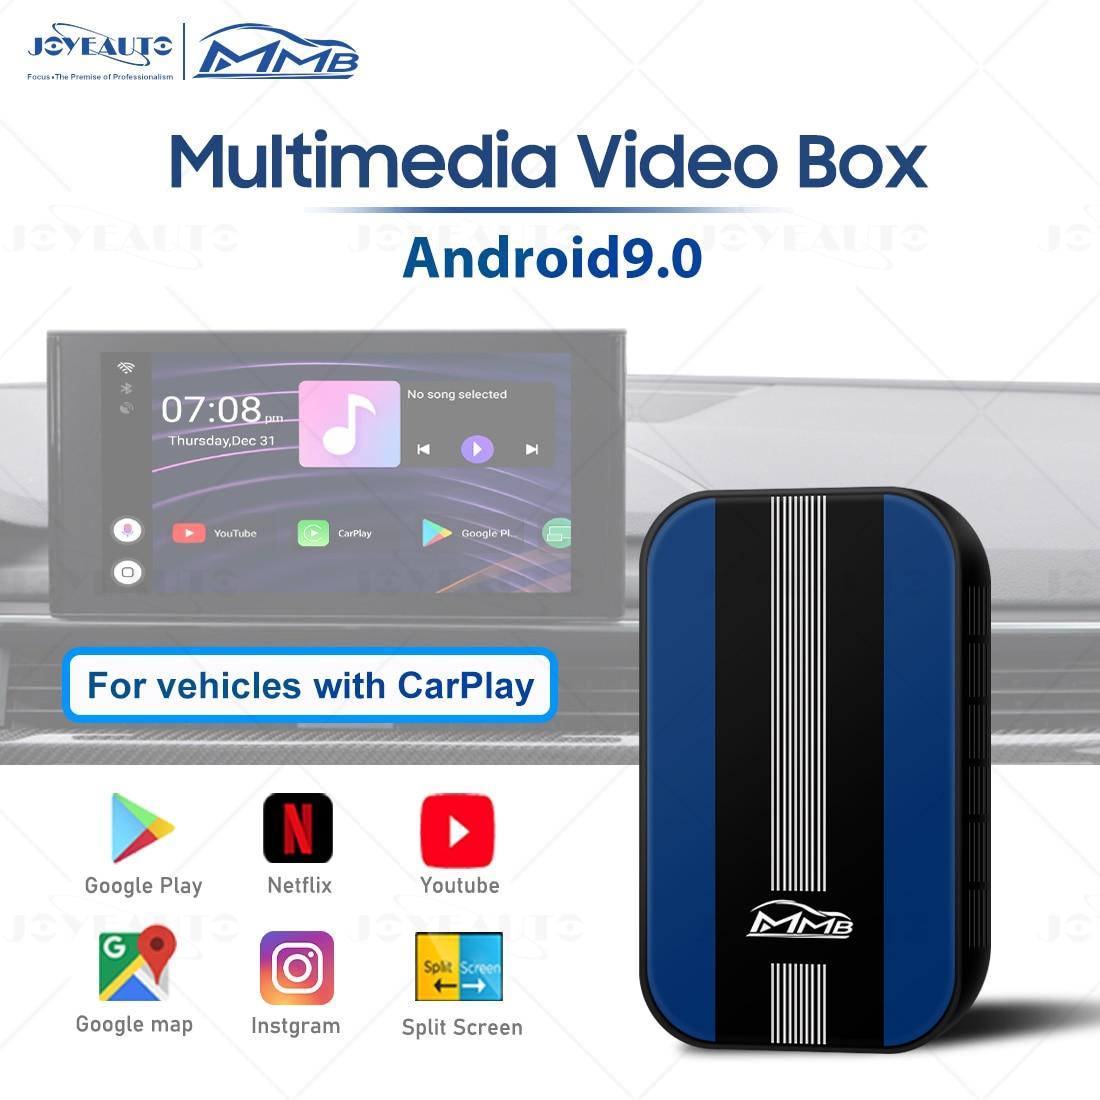 Universal MMB Android 9.0 Box Multimedia Video Box Autoradio Wireless Apple Carplay Netflix Player Car Play Dongle Accessories